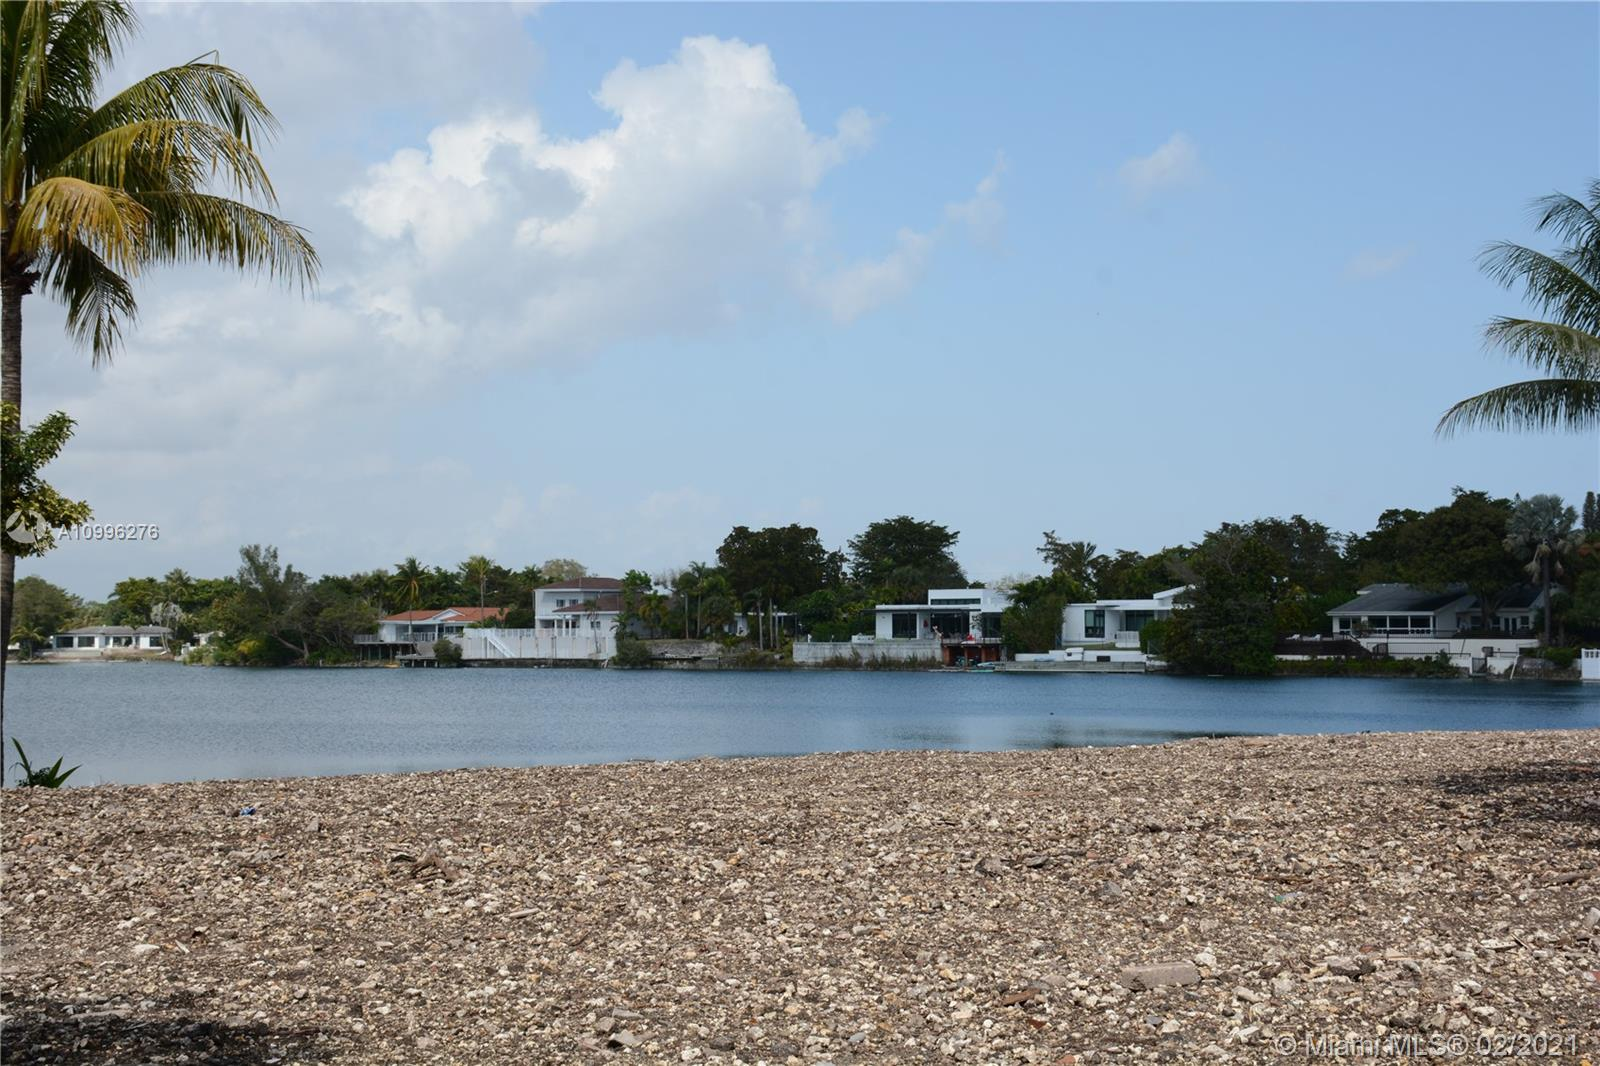 Sky Lake, 2110 NE 191st Dr, North Miami Beach, Florida 33179, image 6